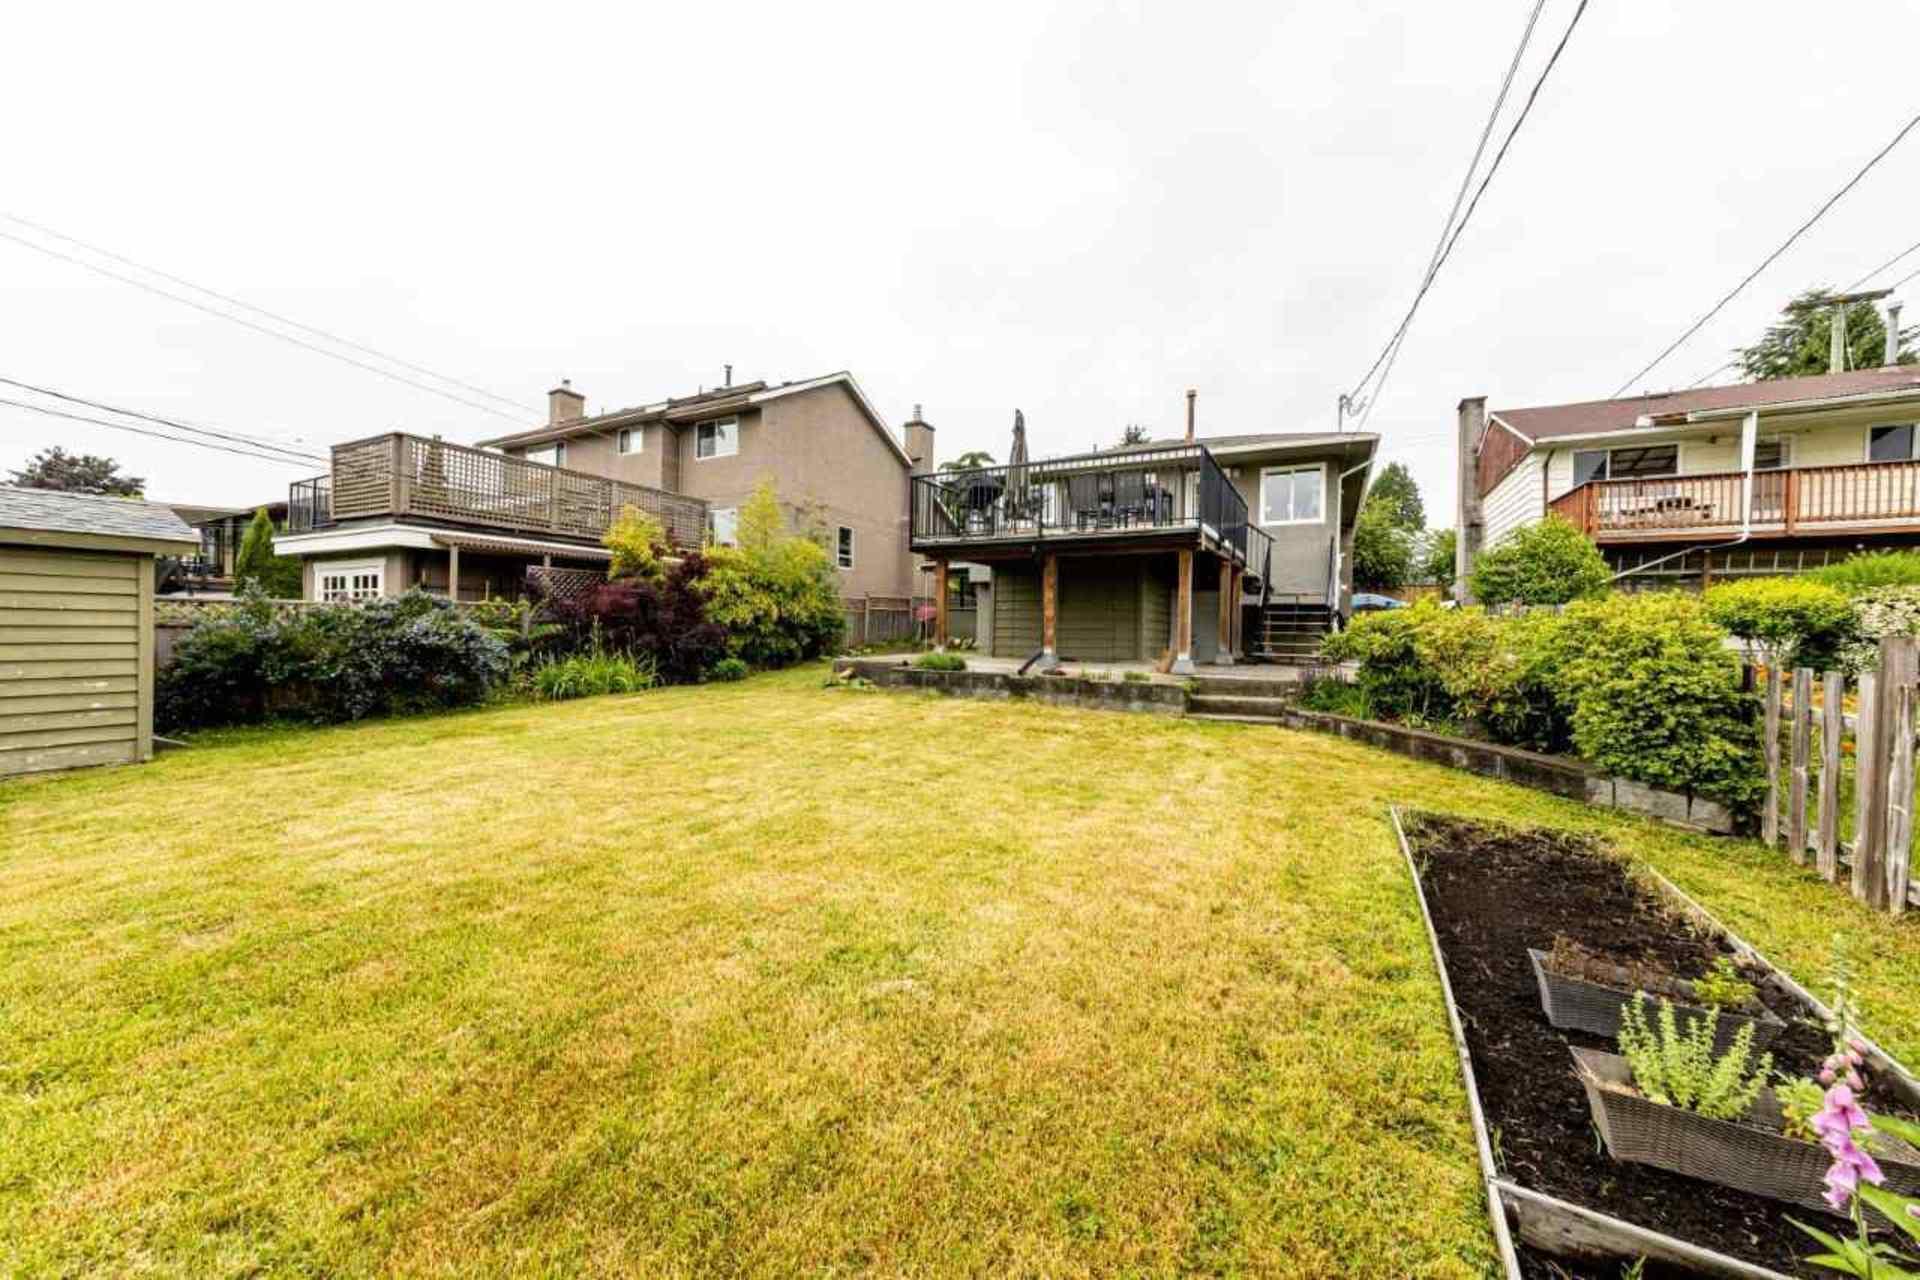 819-e-14th-street-boulevard-north-vancouver-36 at 819 E 14th Street, Boulevard, North Vancouver